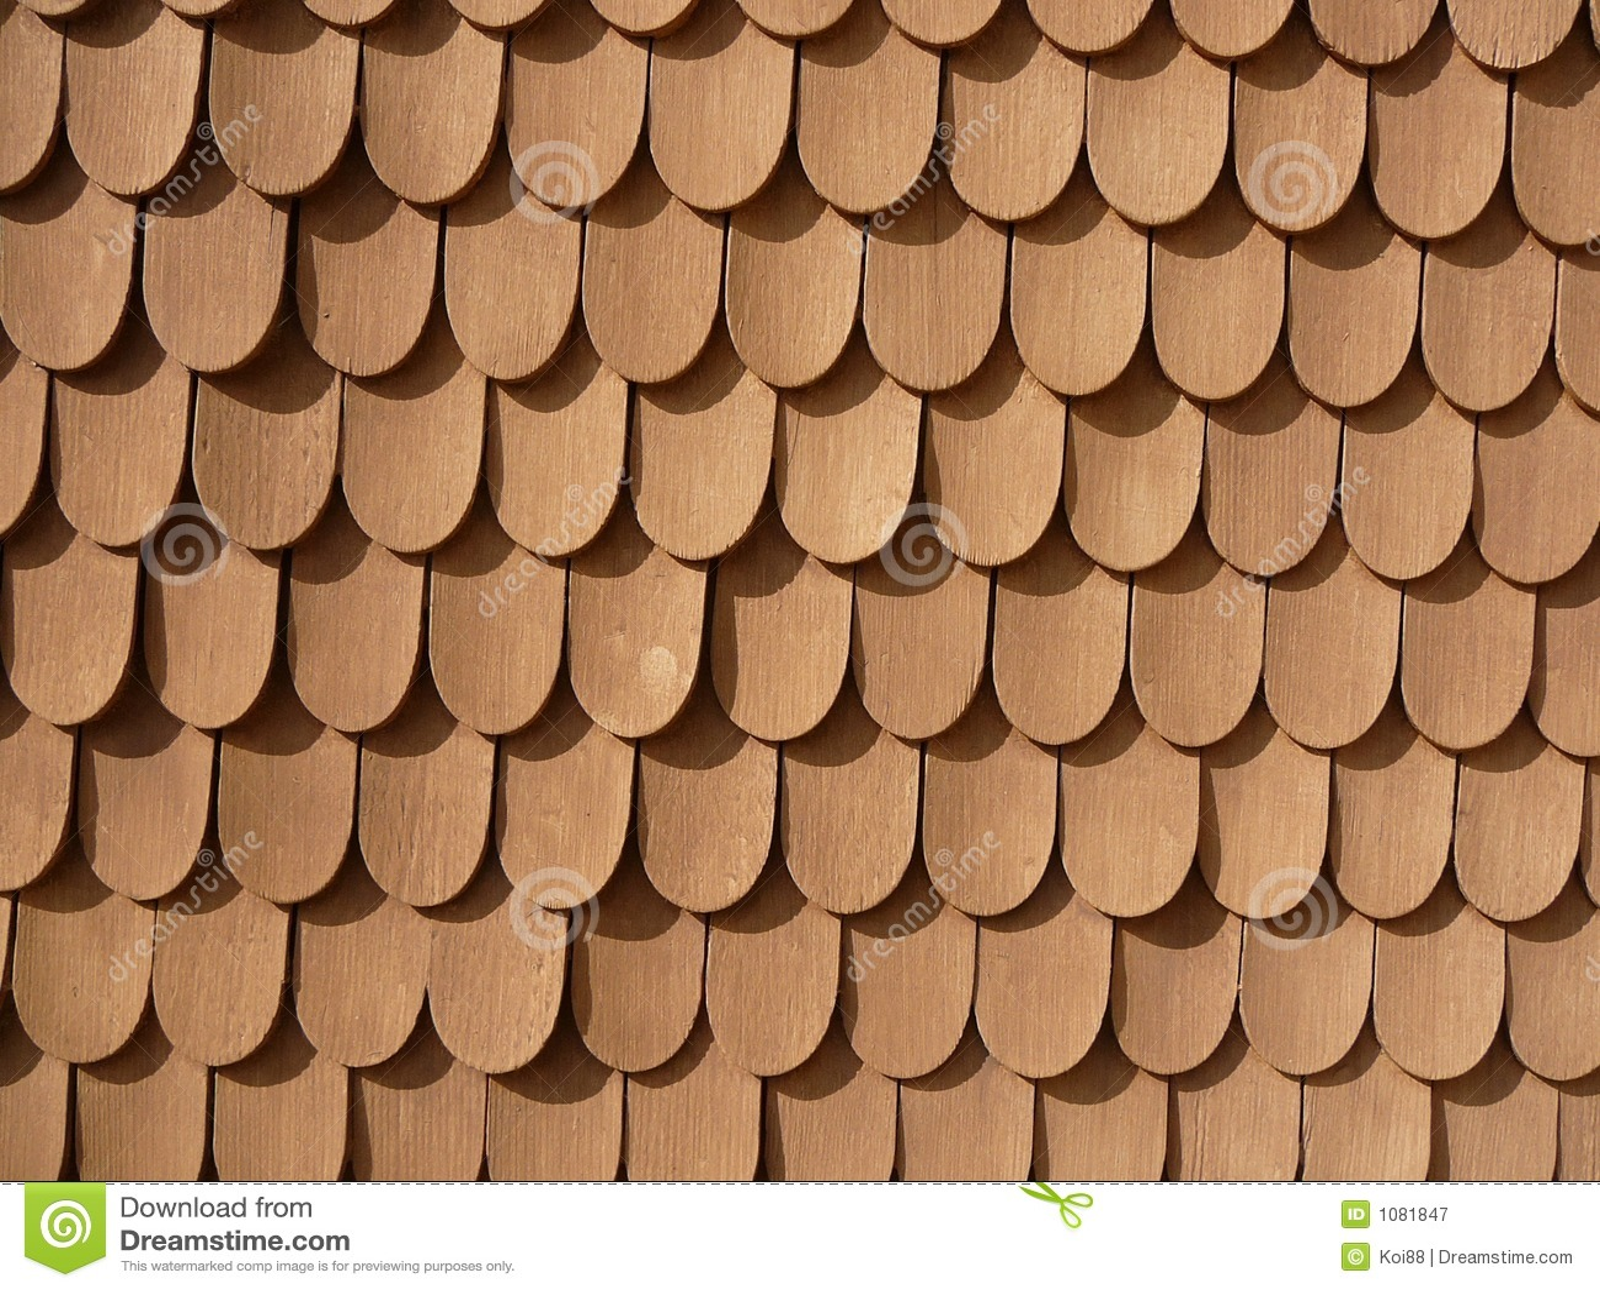 Fish Scale Design on Wall (Schachen Haus)